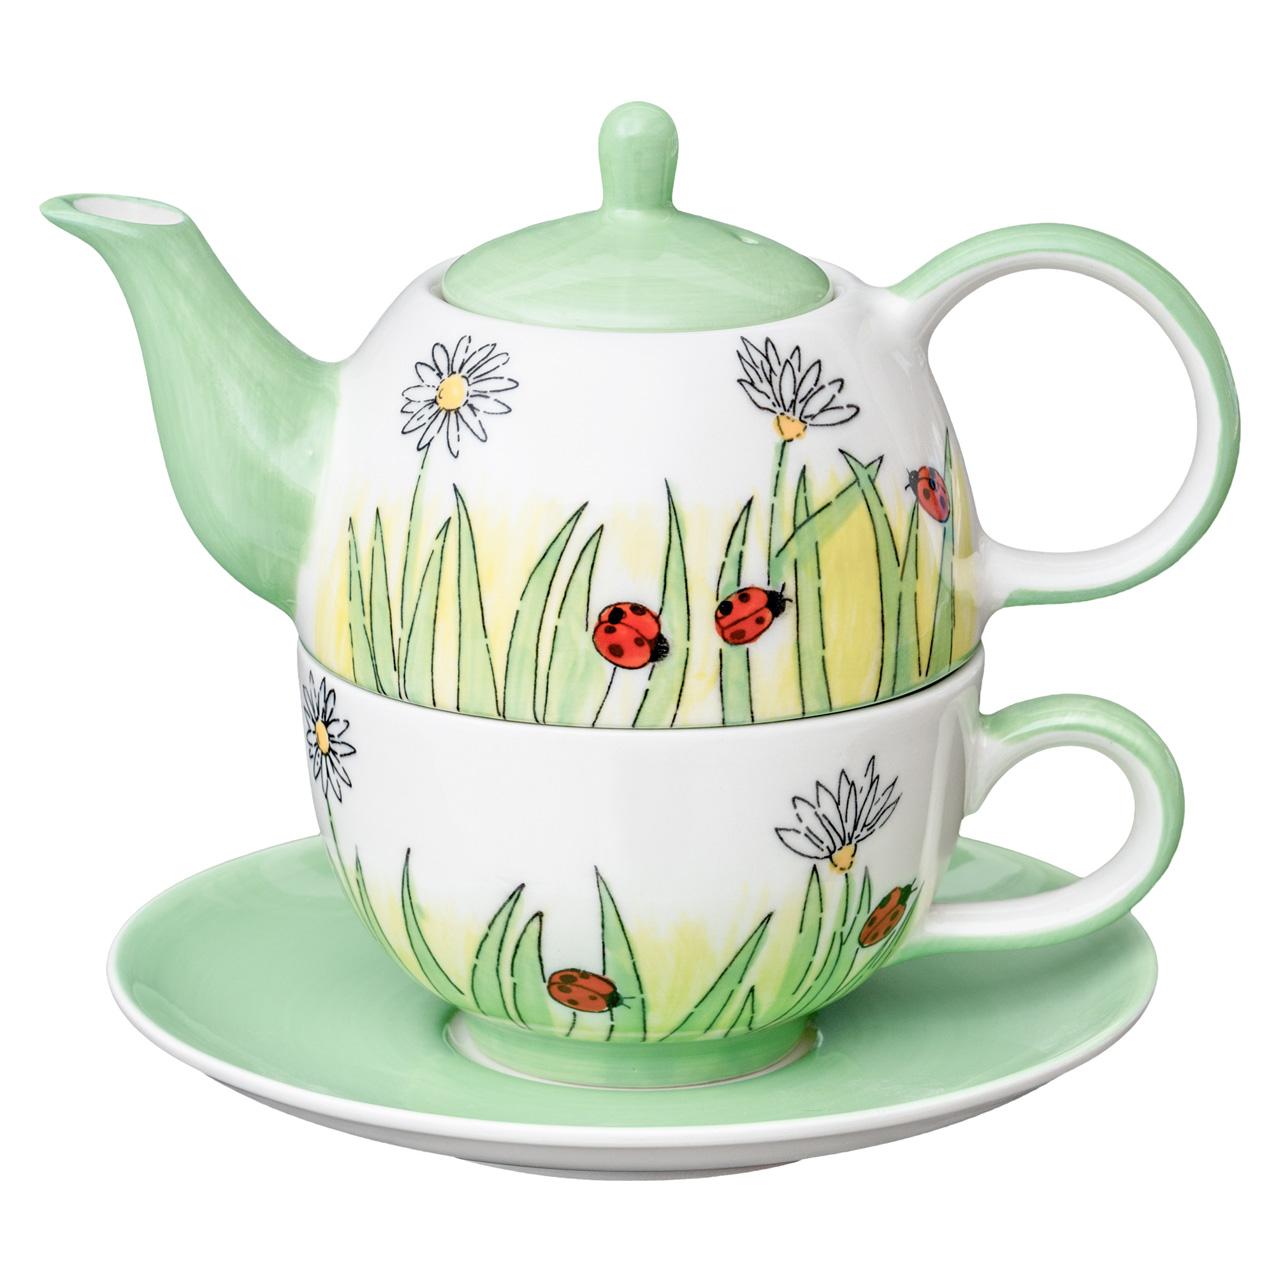 Tea for one - Frühlingserwachen